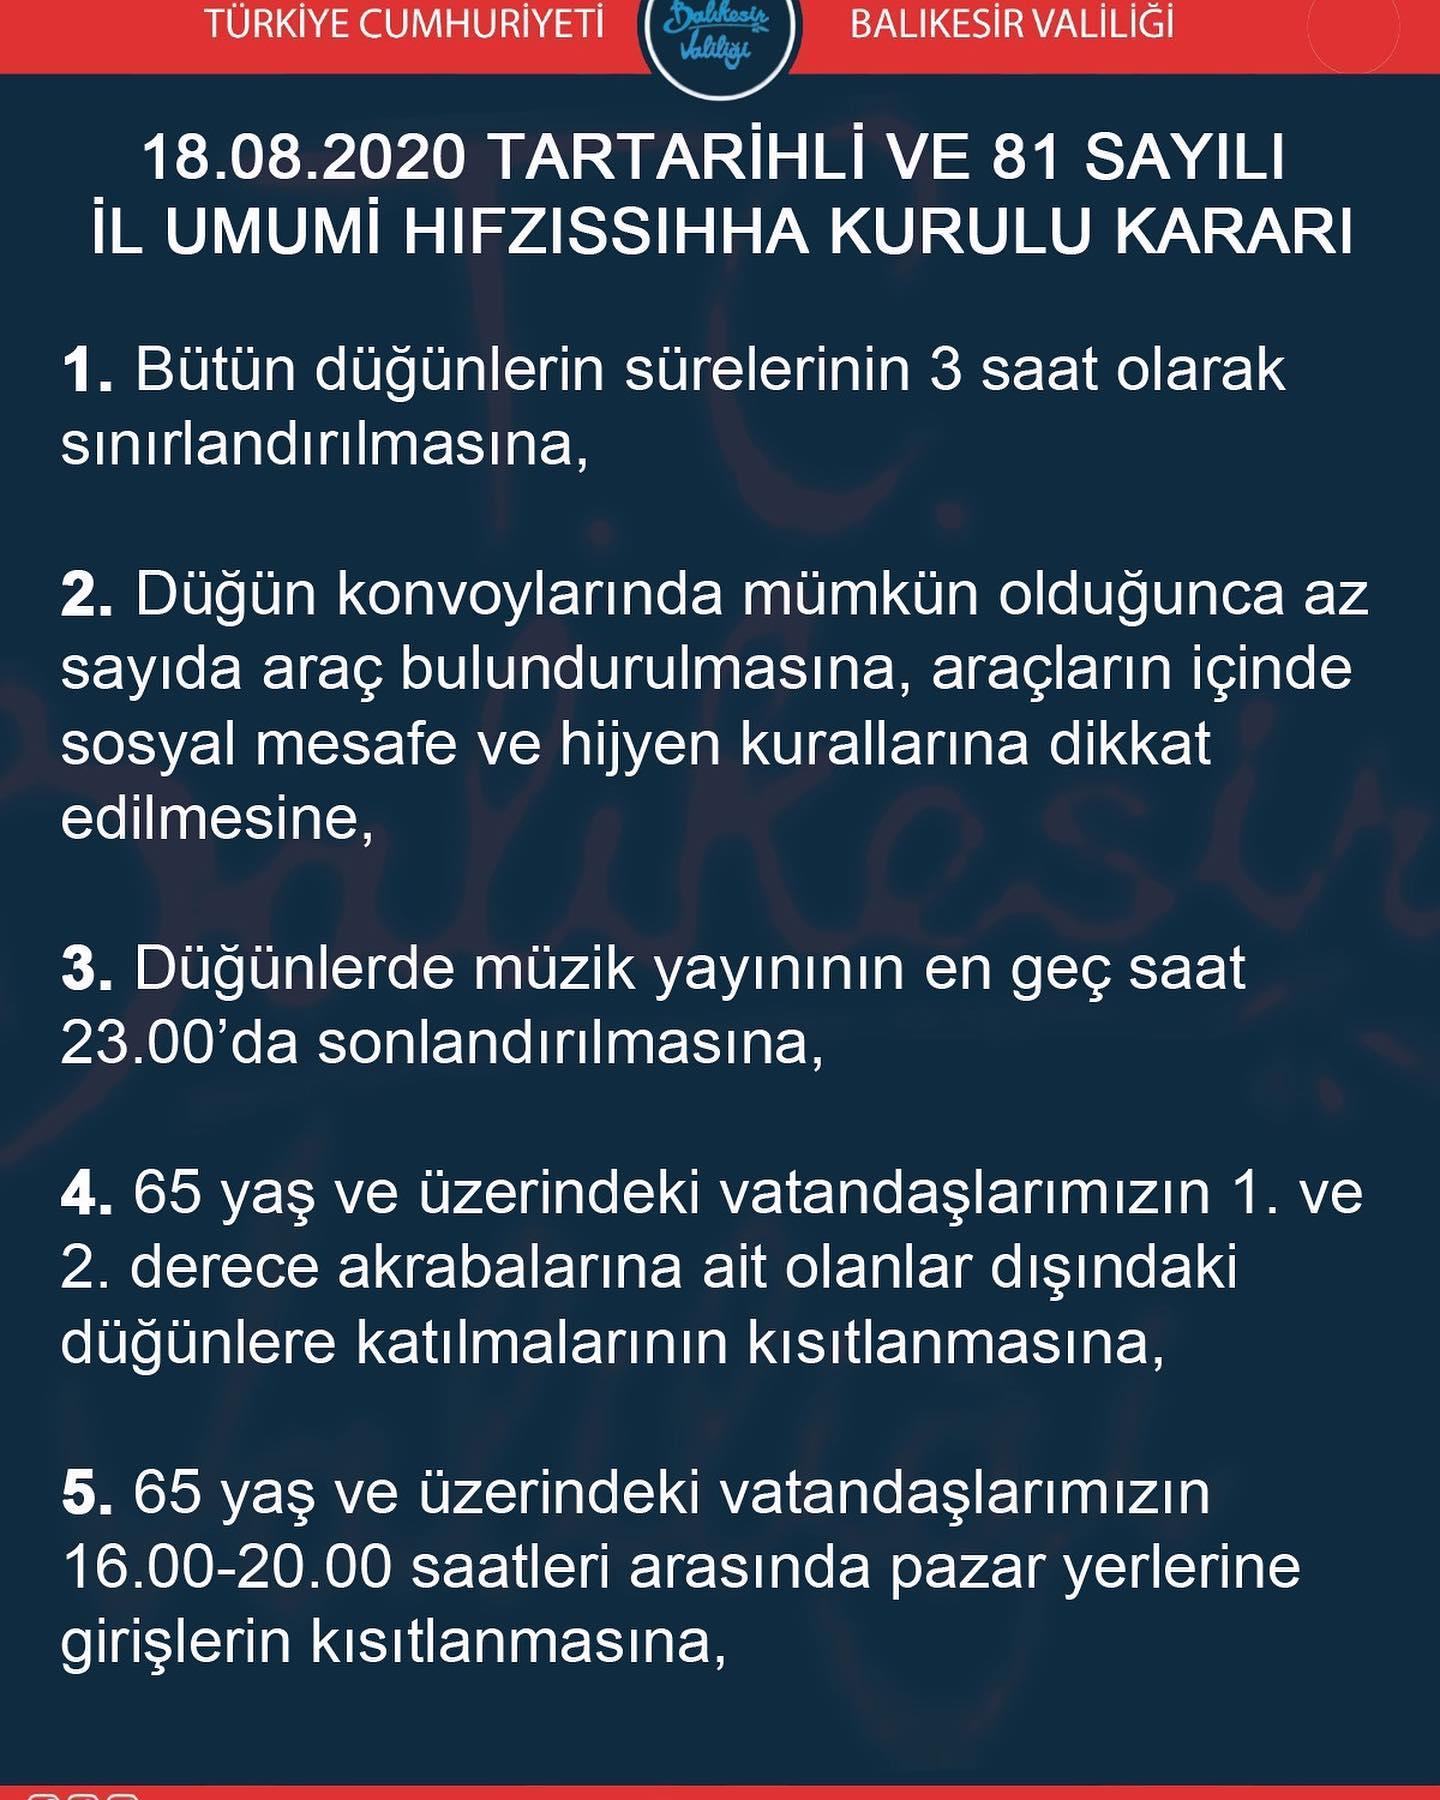 PANDEMİ TEDBİRLERİNE İLİŞKİN İL HIFZISIHHA KURULU KARARI